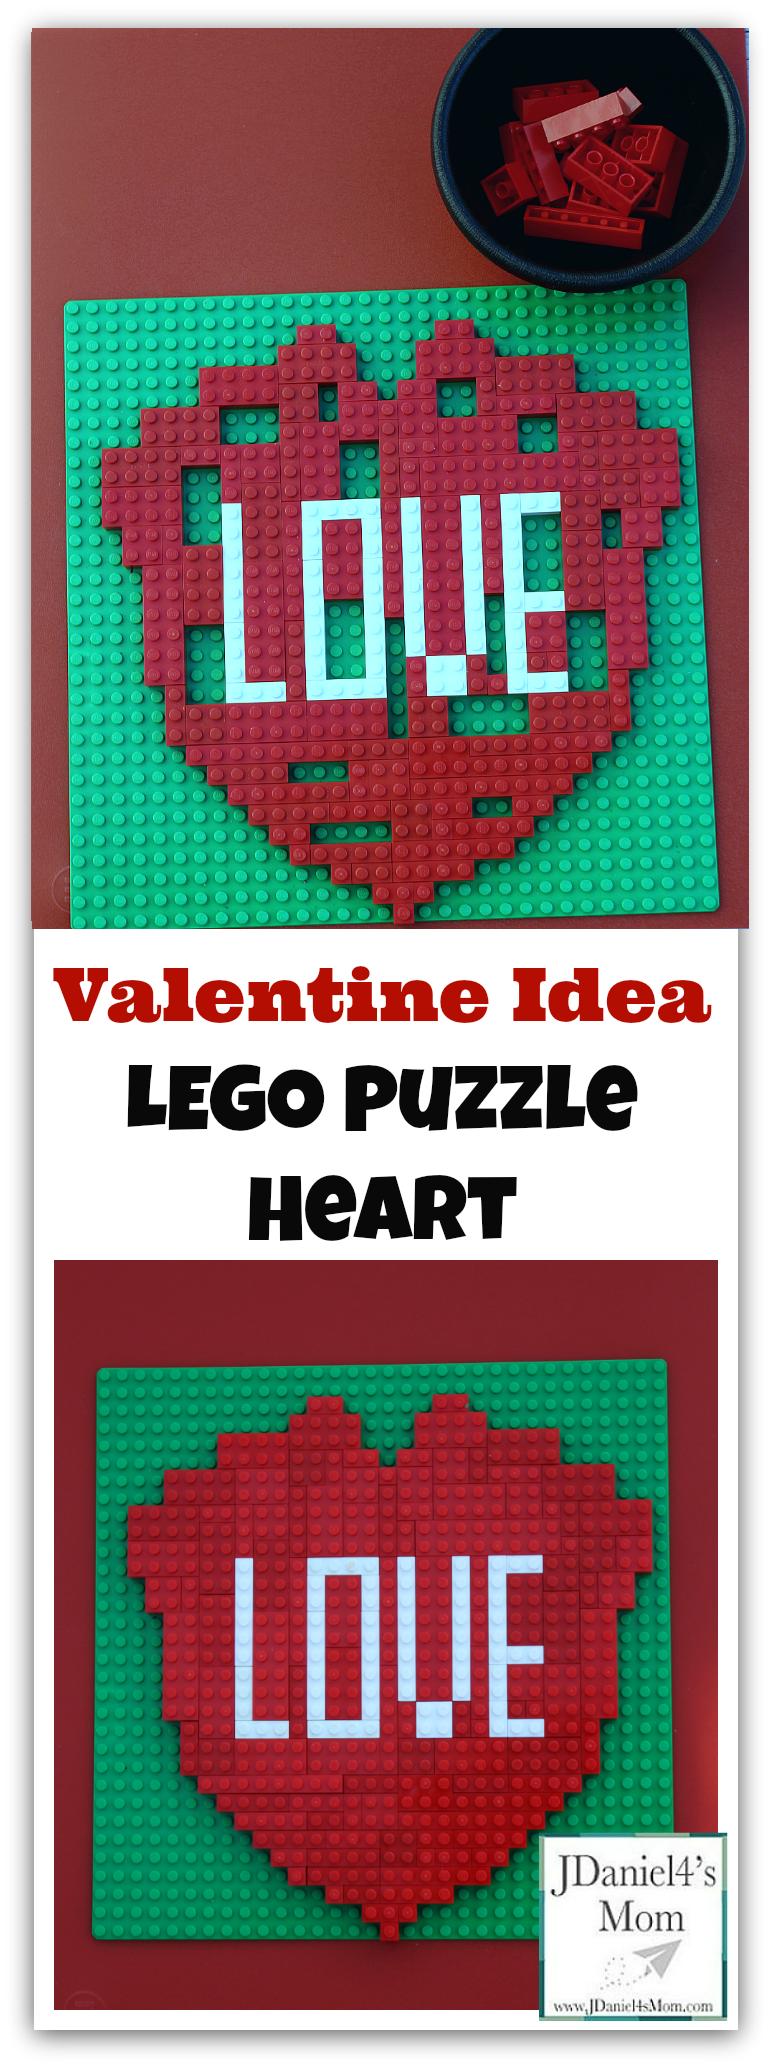 Valentine Ideas- LEGO Heart Puzzle   JDaniel4's Mom (From ...